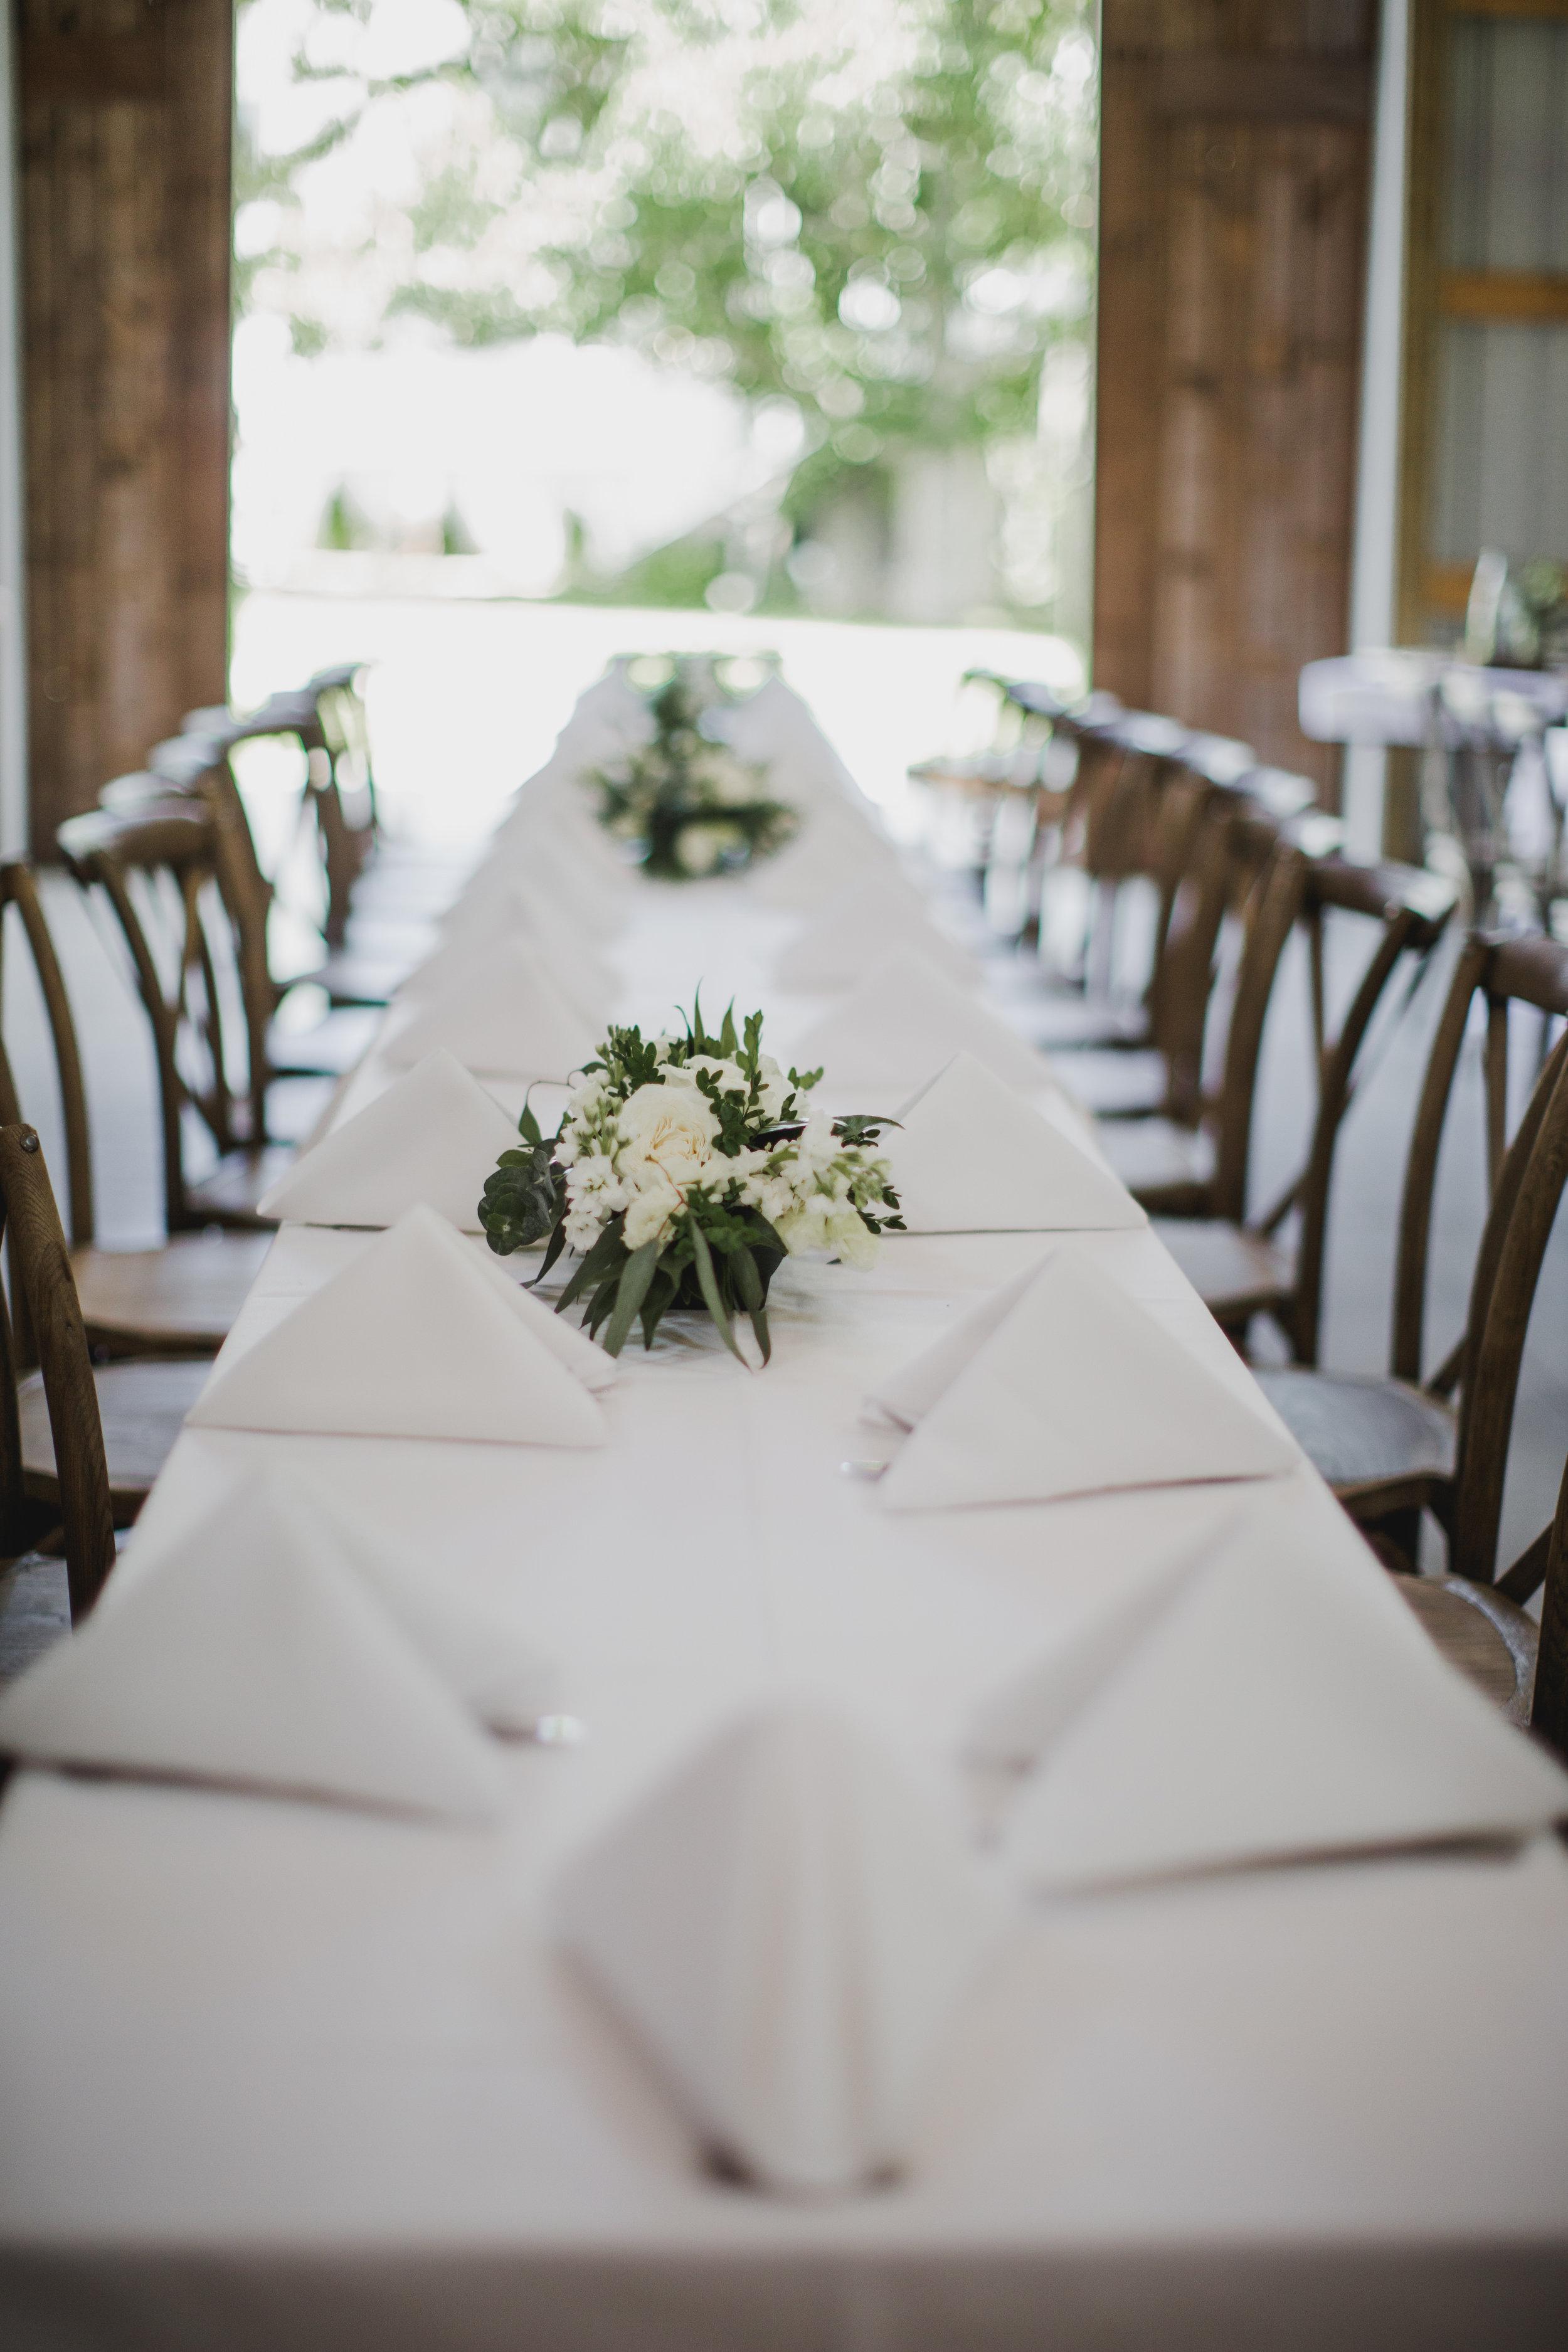 Sibyl_Sophia_Wedding_Florist_Mason_City_Diamond_Oaks_Tables.jpg.jpg